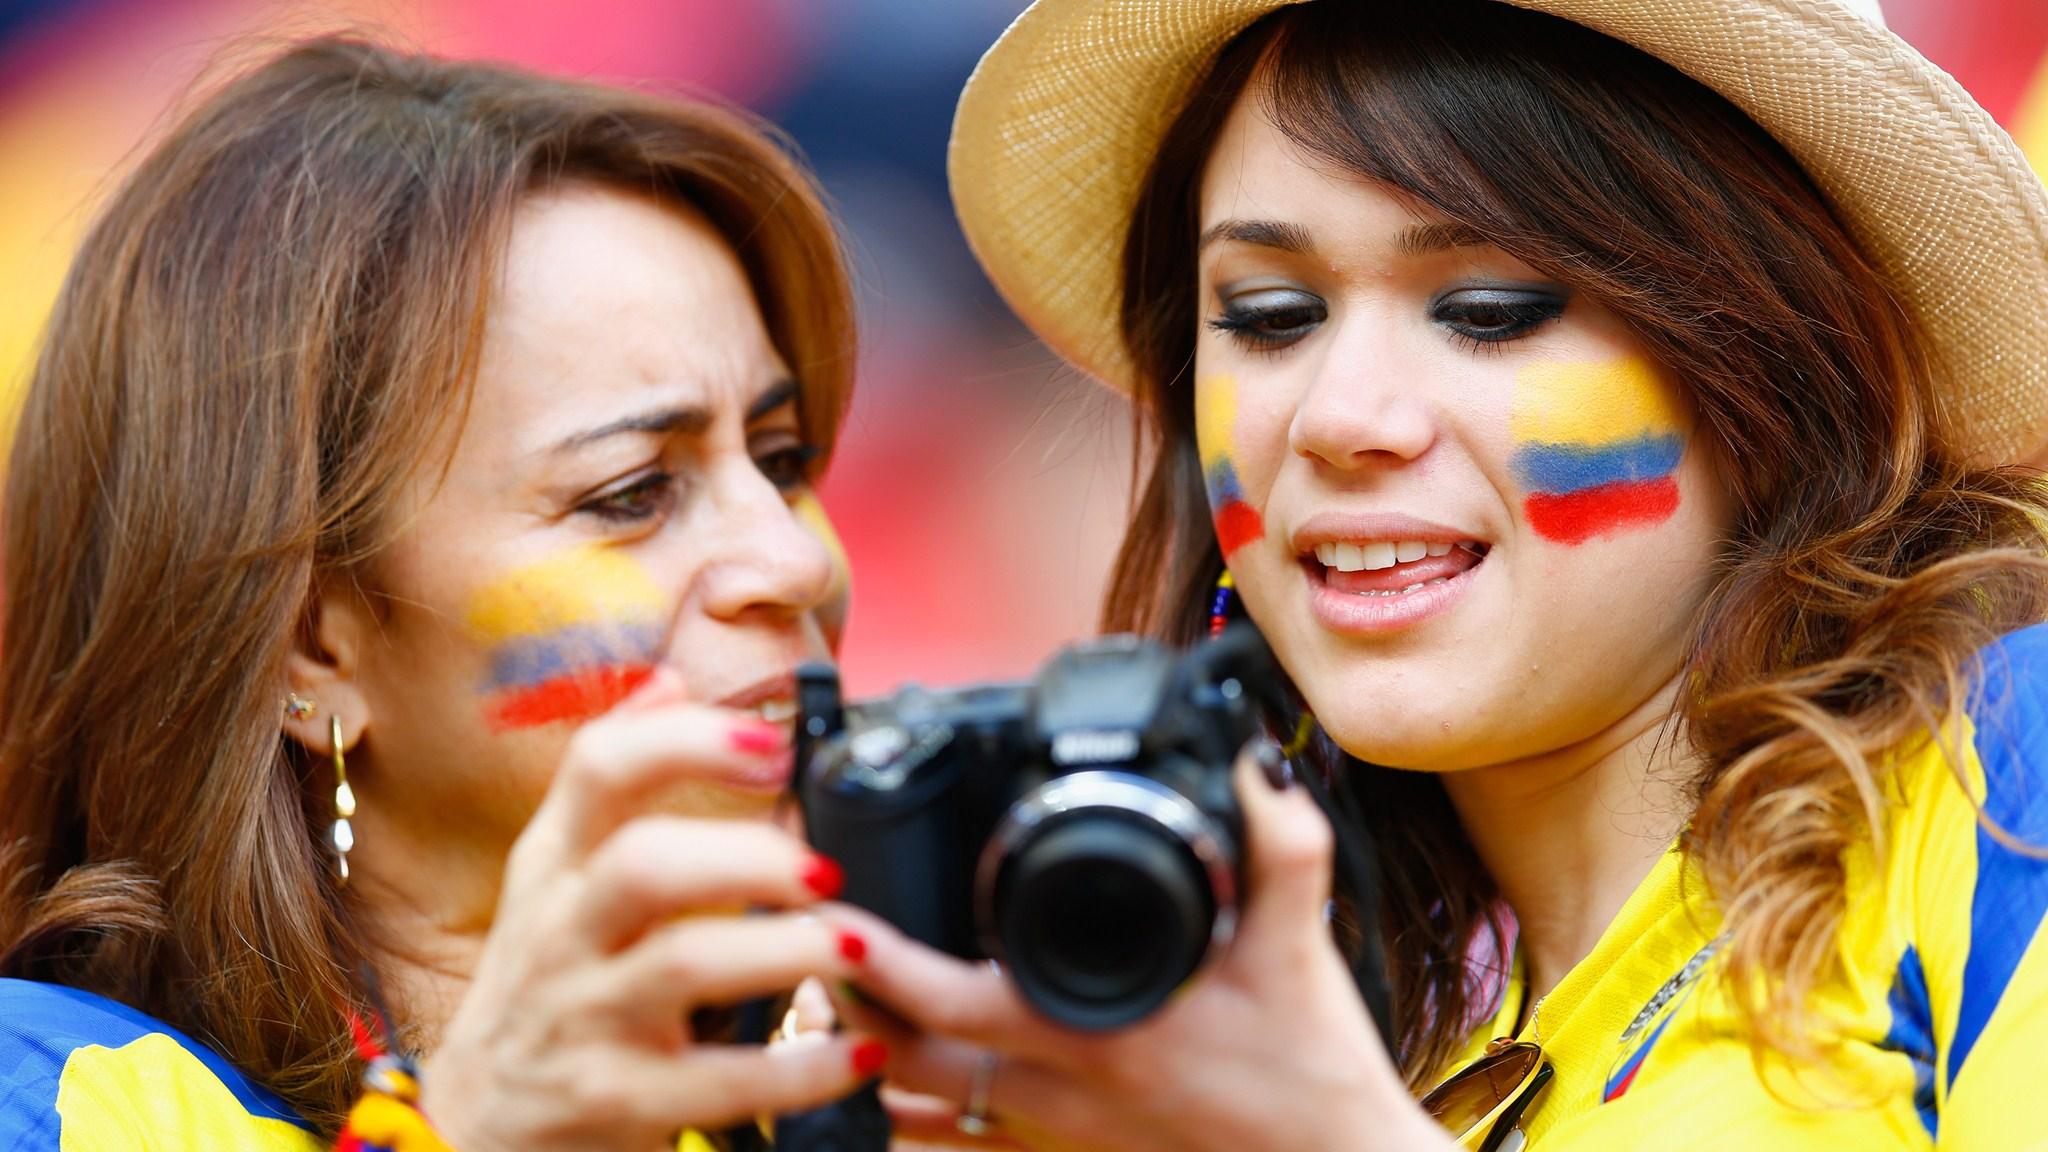 144 - Switzerland-Ecuador [2-1] -- 15 Jun 2014 - 13-00 -- Brasilia - Estadio Nacional